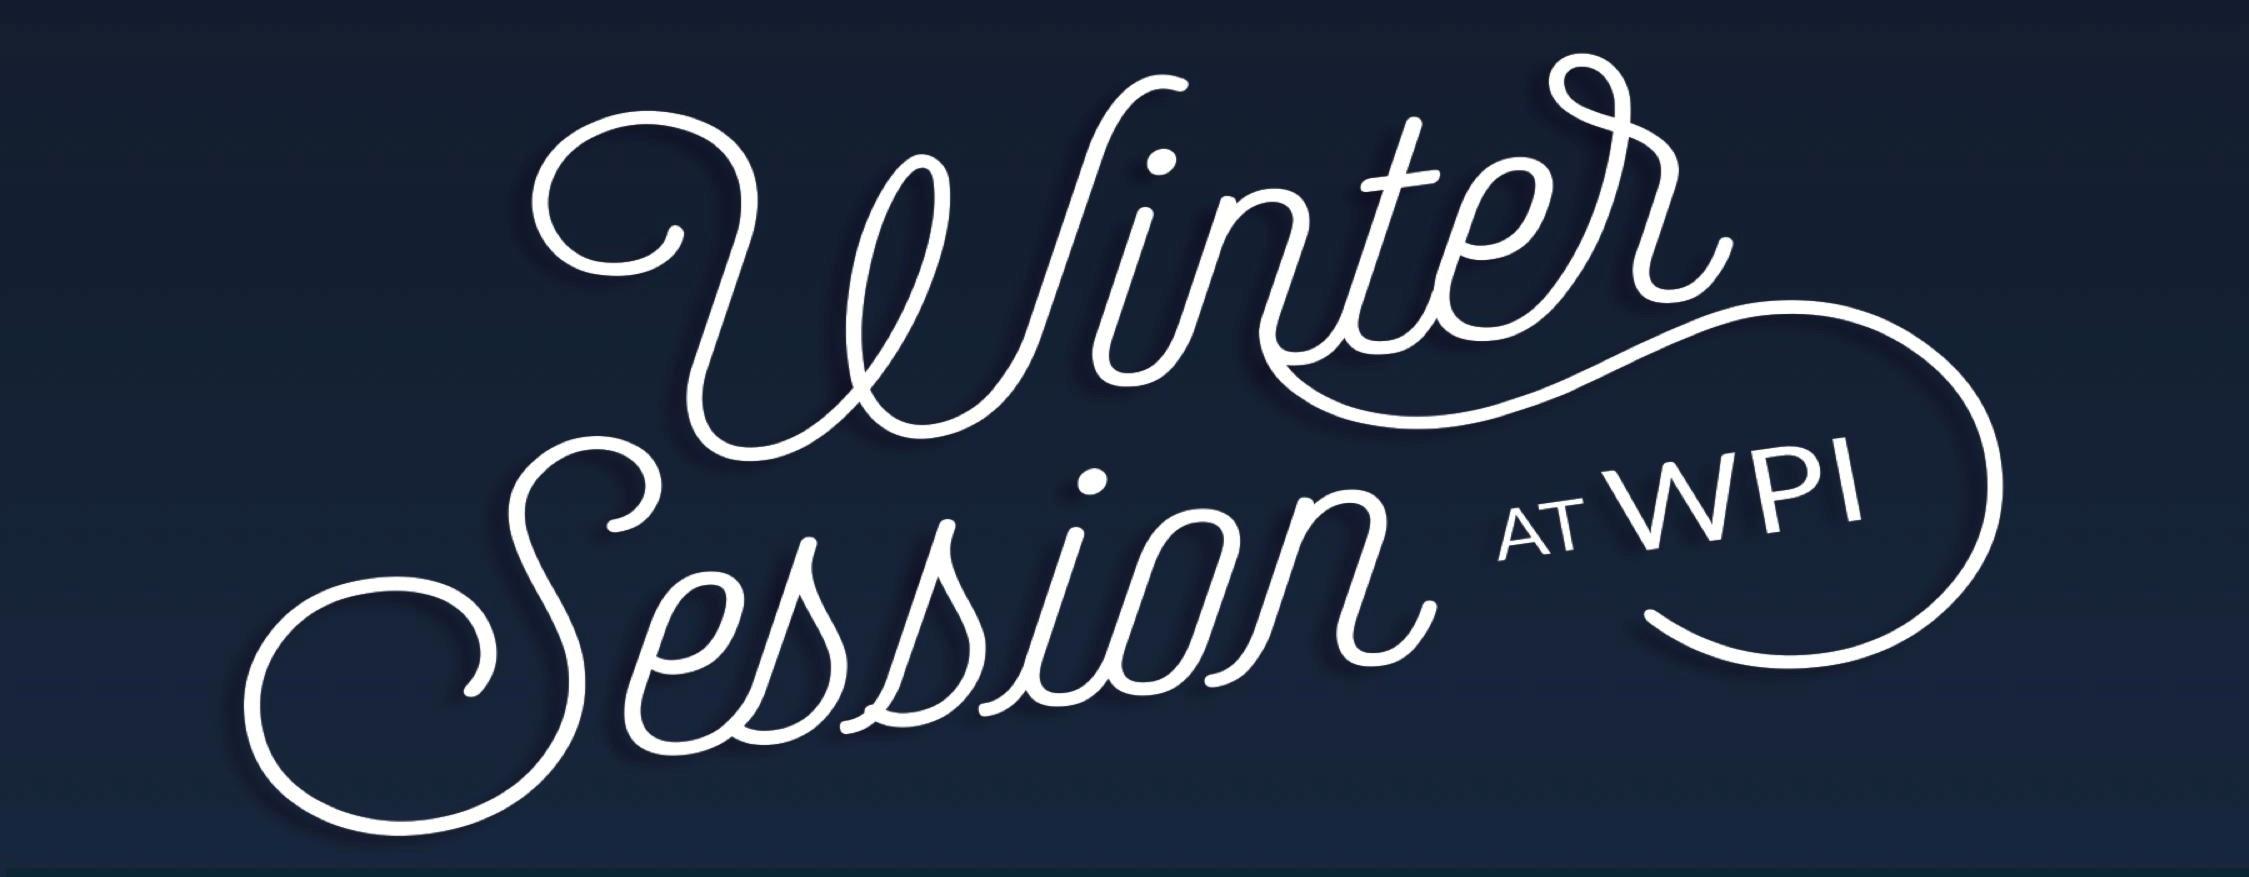 Wintersession logo